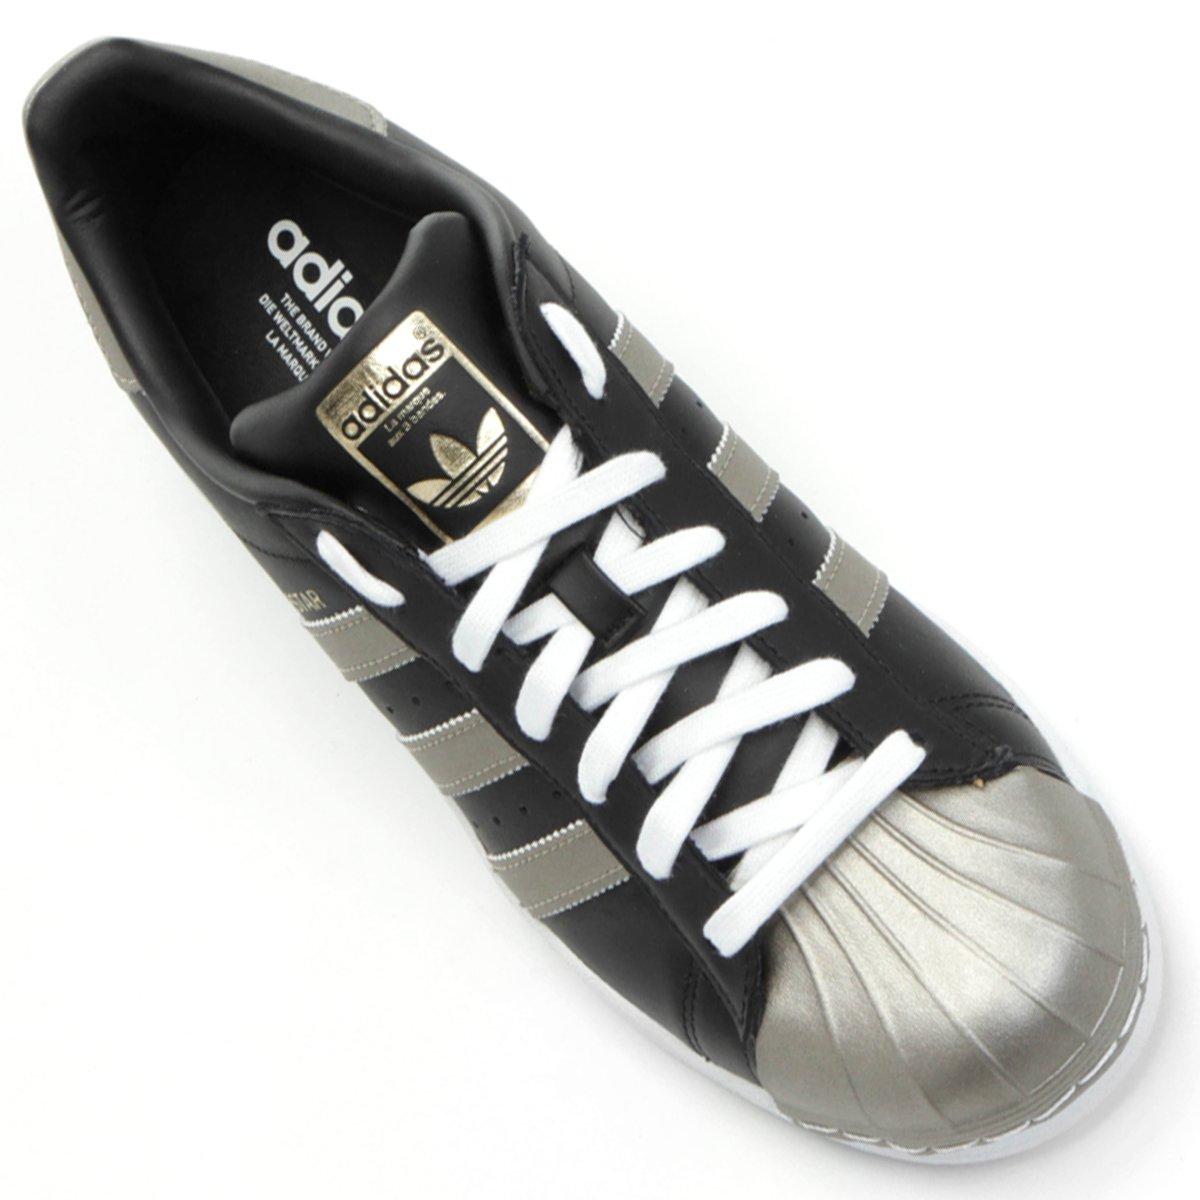 75bdd40314 Tênis Adidas Superstar Metallic - Compre Agora